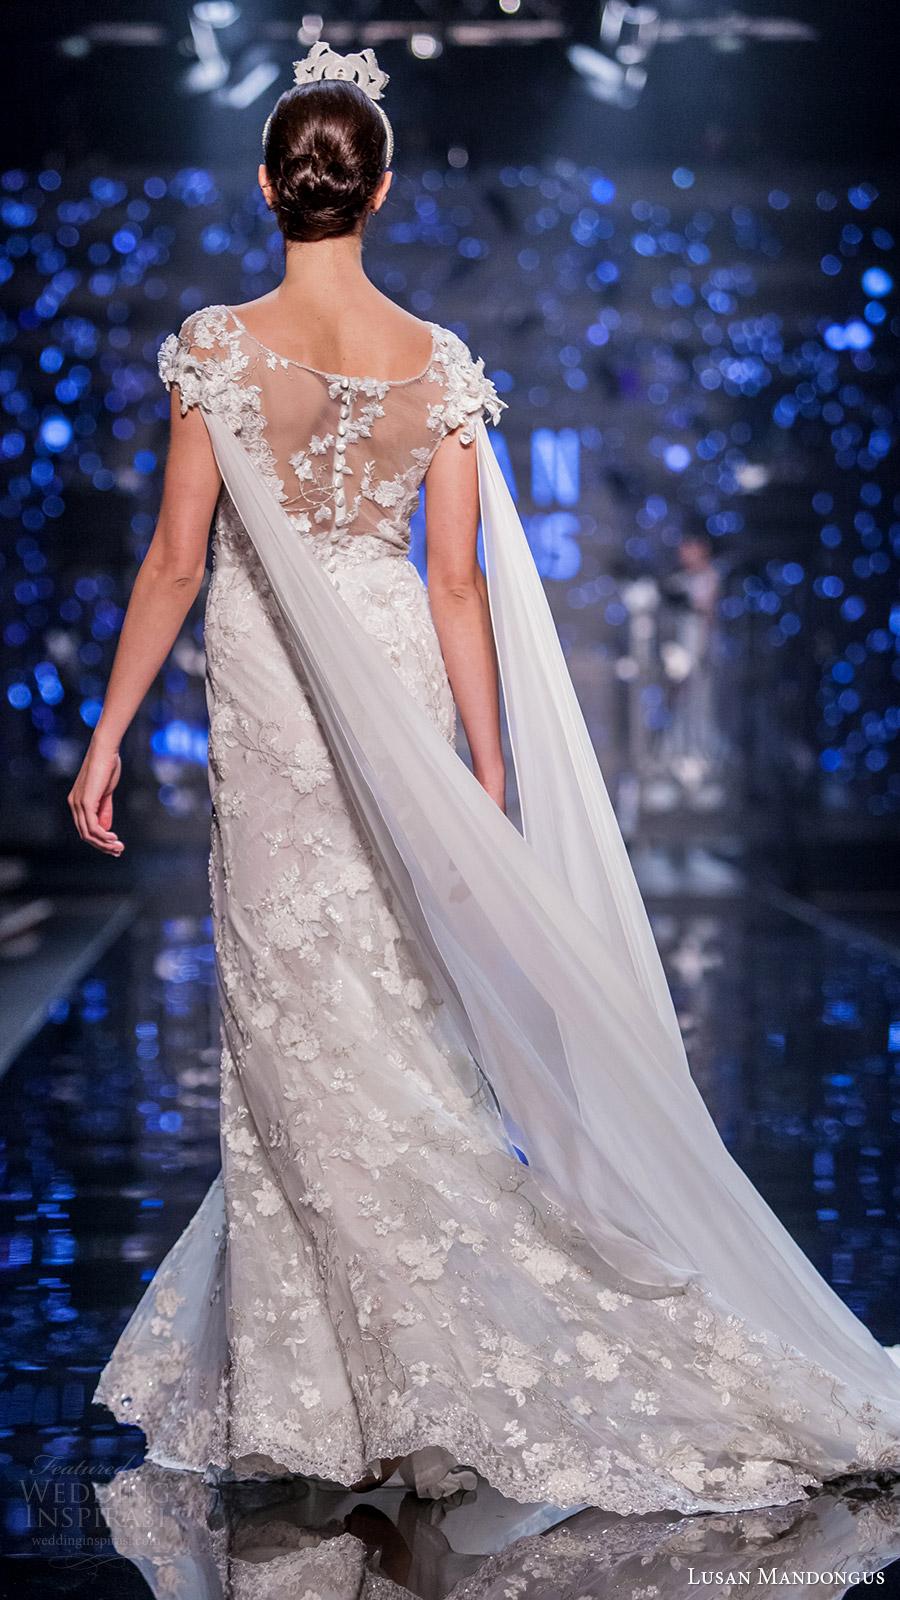 lusan mandongus bridal 2017 cap sleevess illusion boat neck lace sheath wedding dress (leonids) bv trail